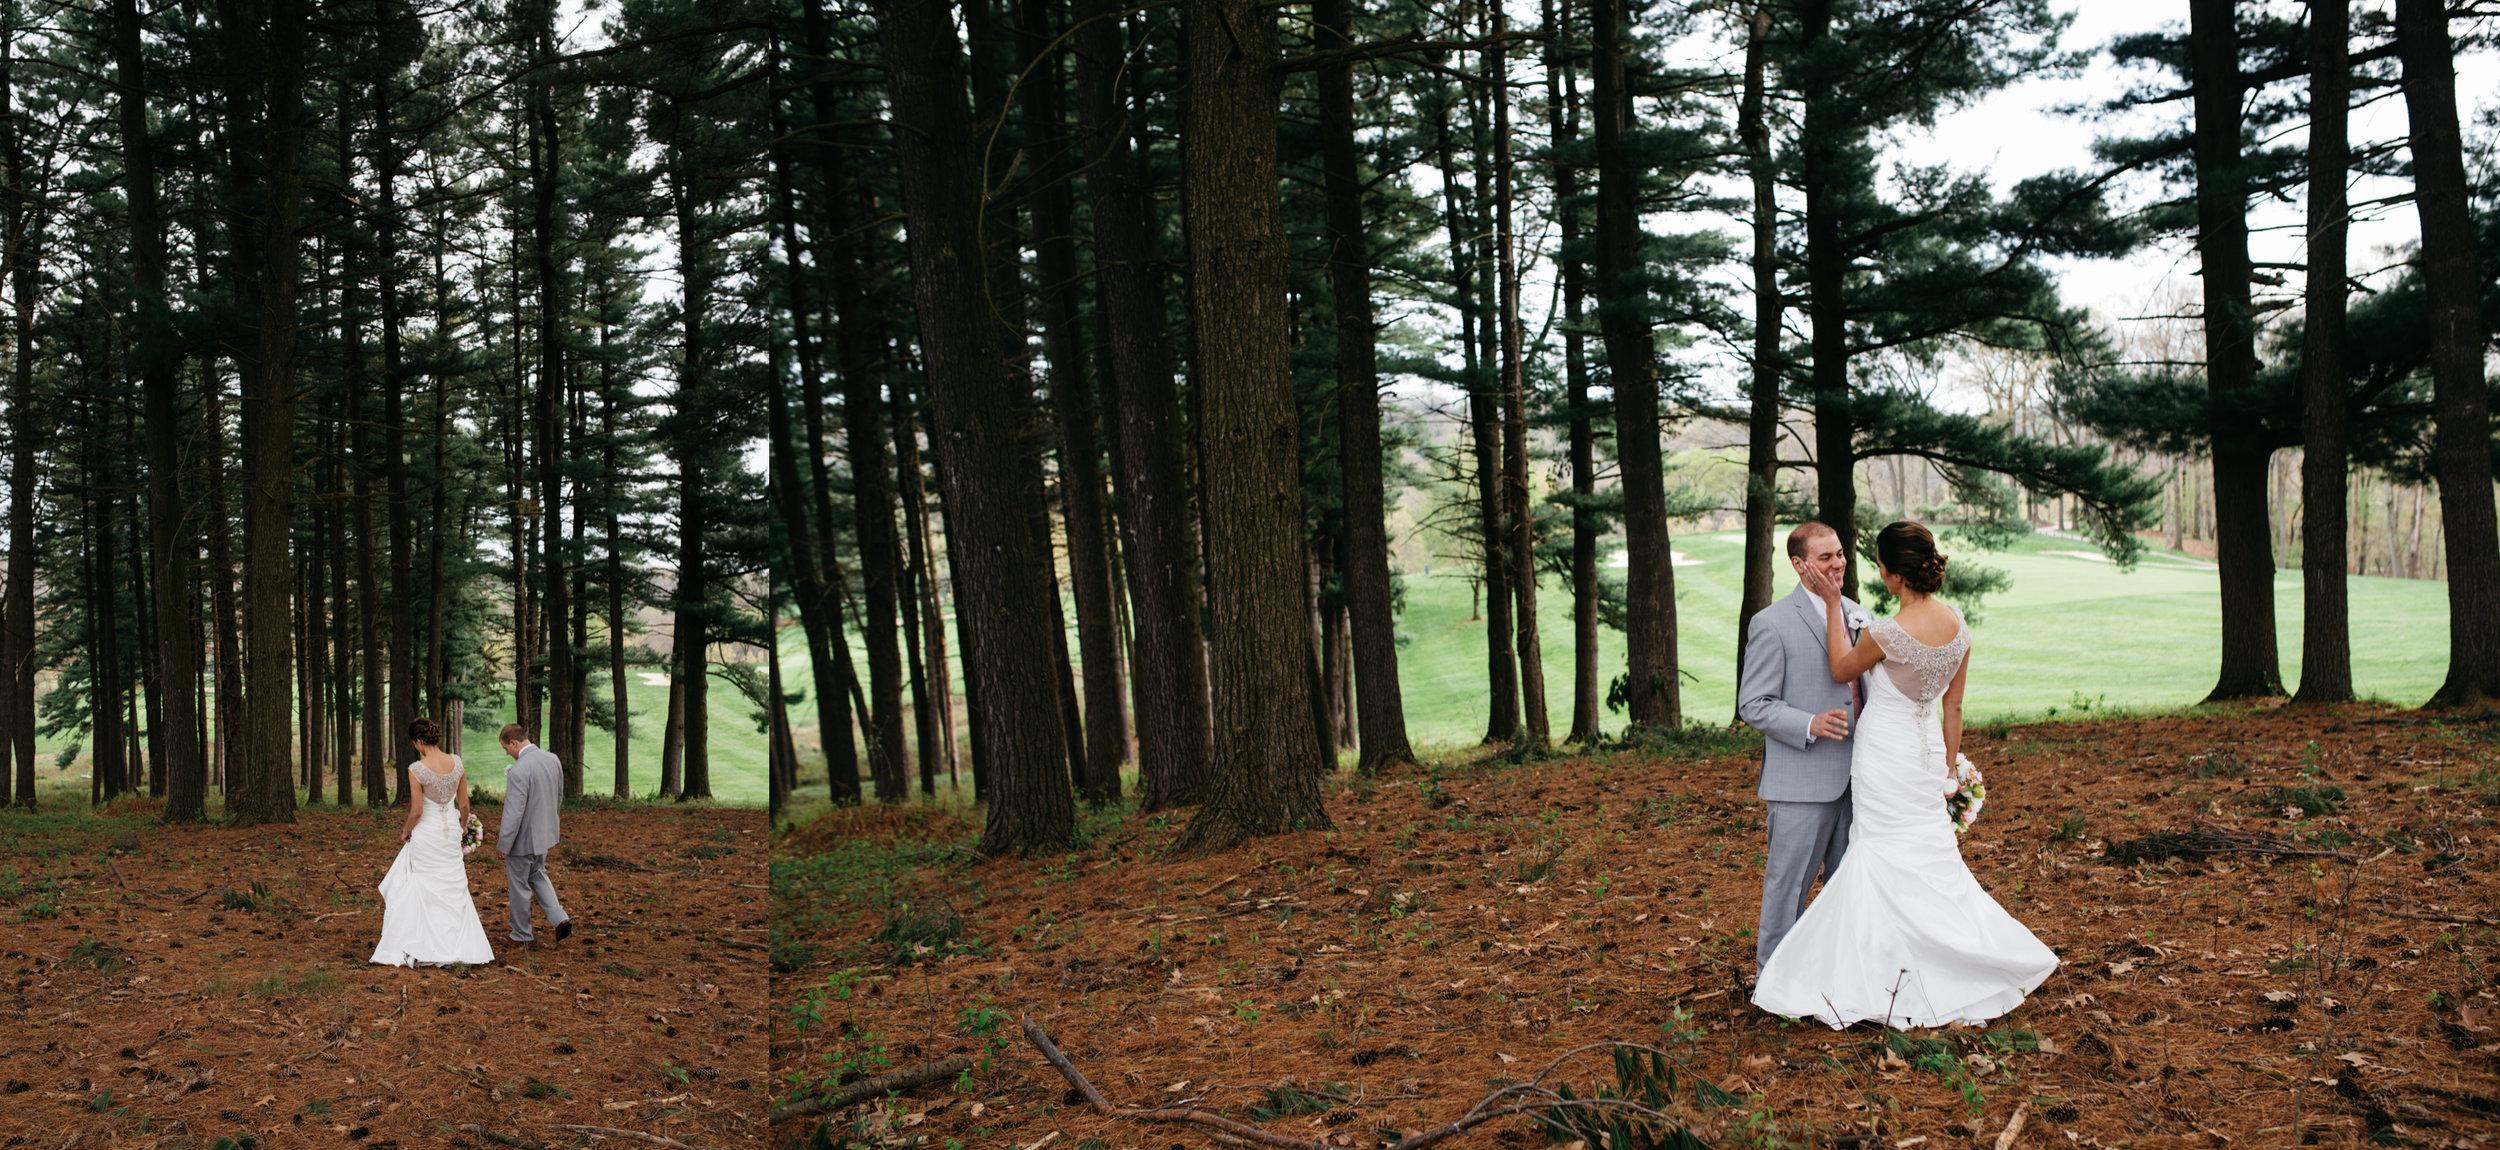 country club wedding pittsburgh pa mariah fisher photography.jpg